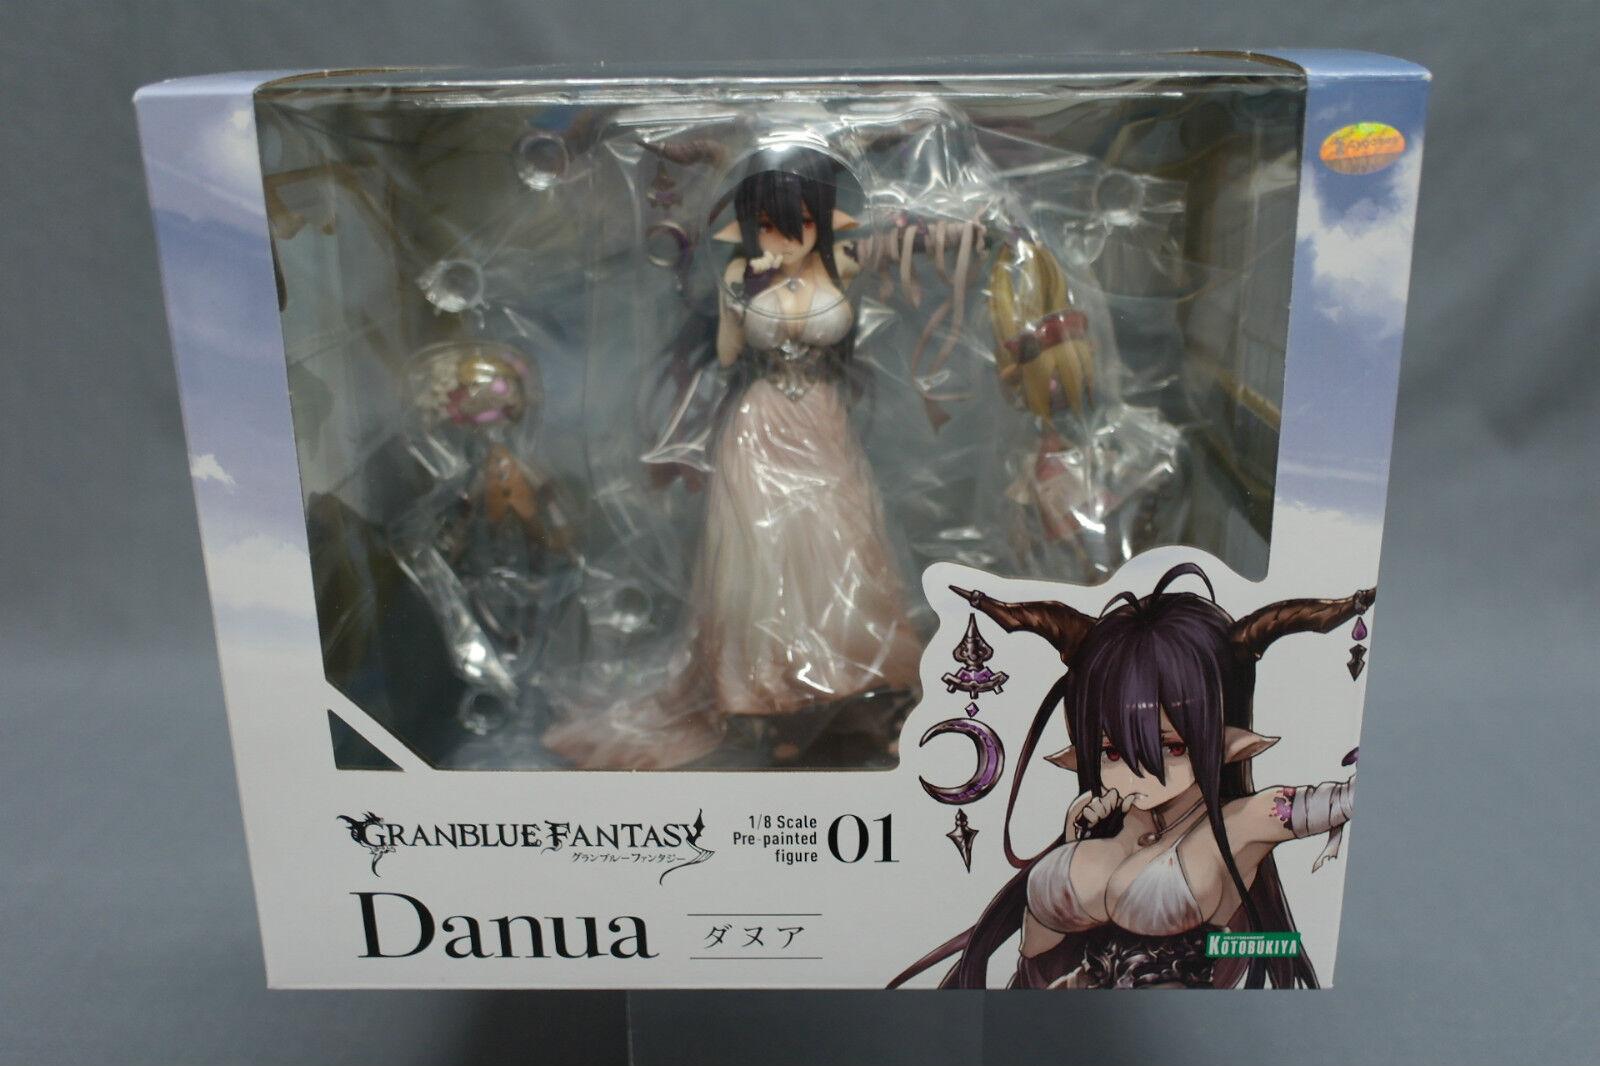 GRANblu fantasycc Danua 1 8 Kotobukiya Japan  nuovo  fino al 50% di sconto